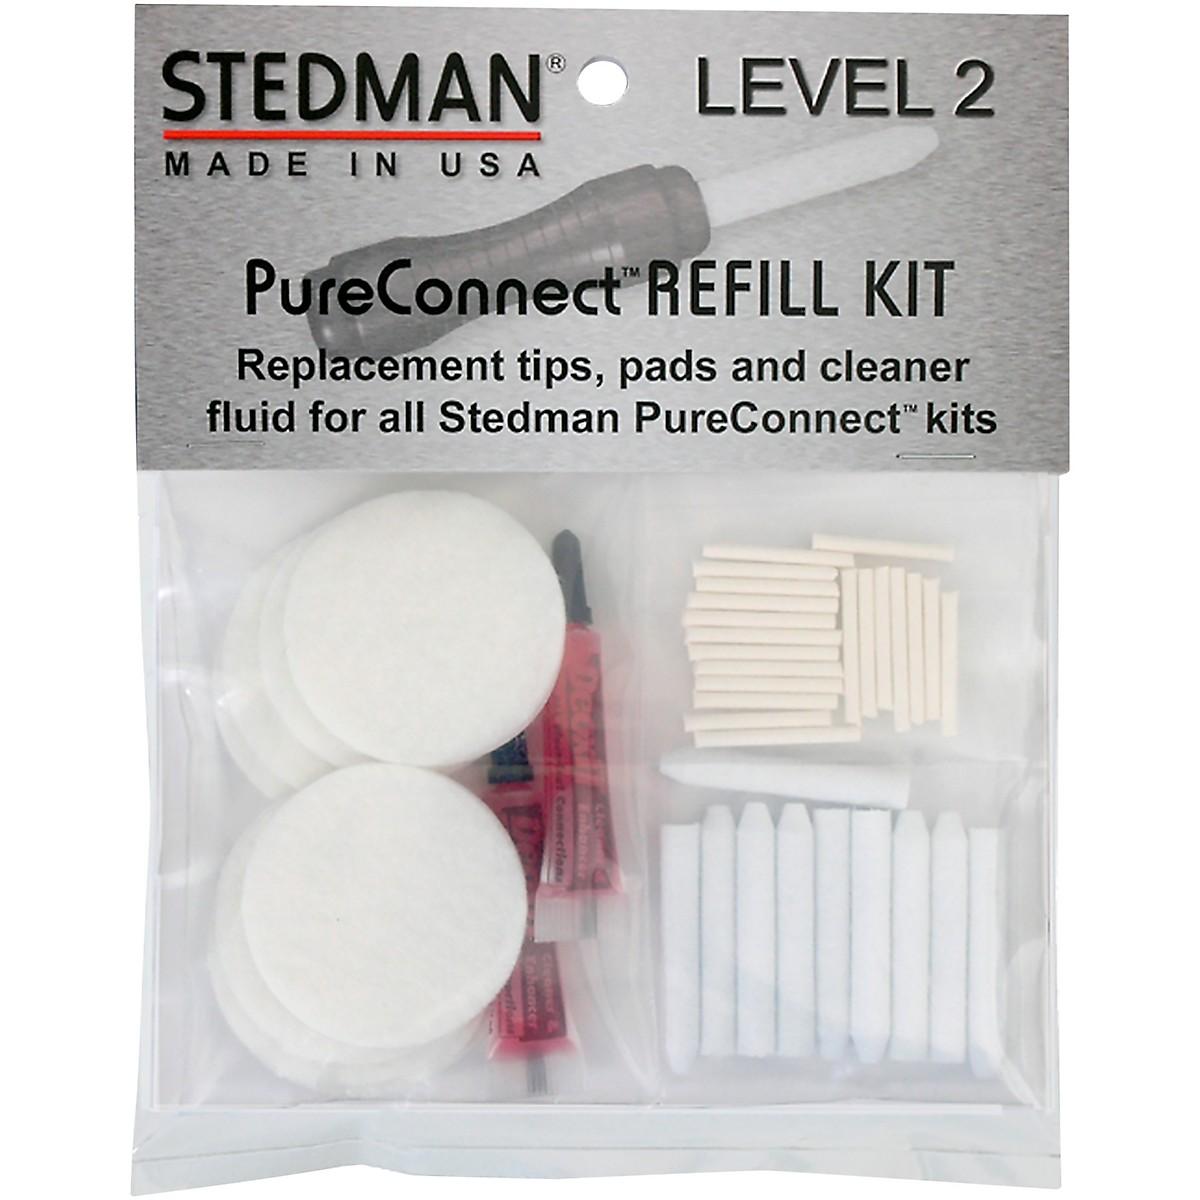 Stedman Pureconnect Level 2 Refill Kit